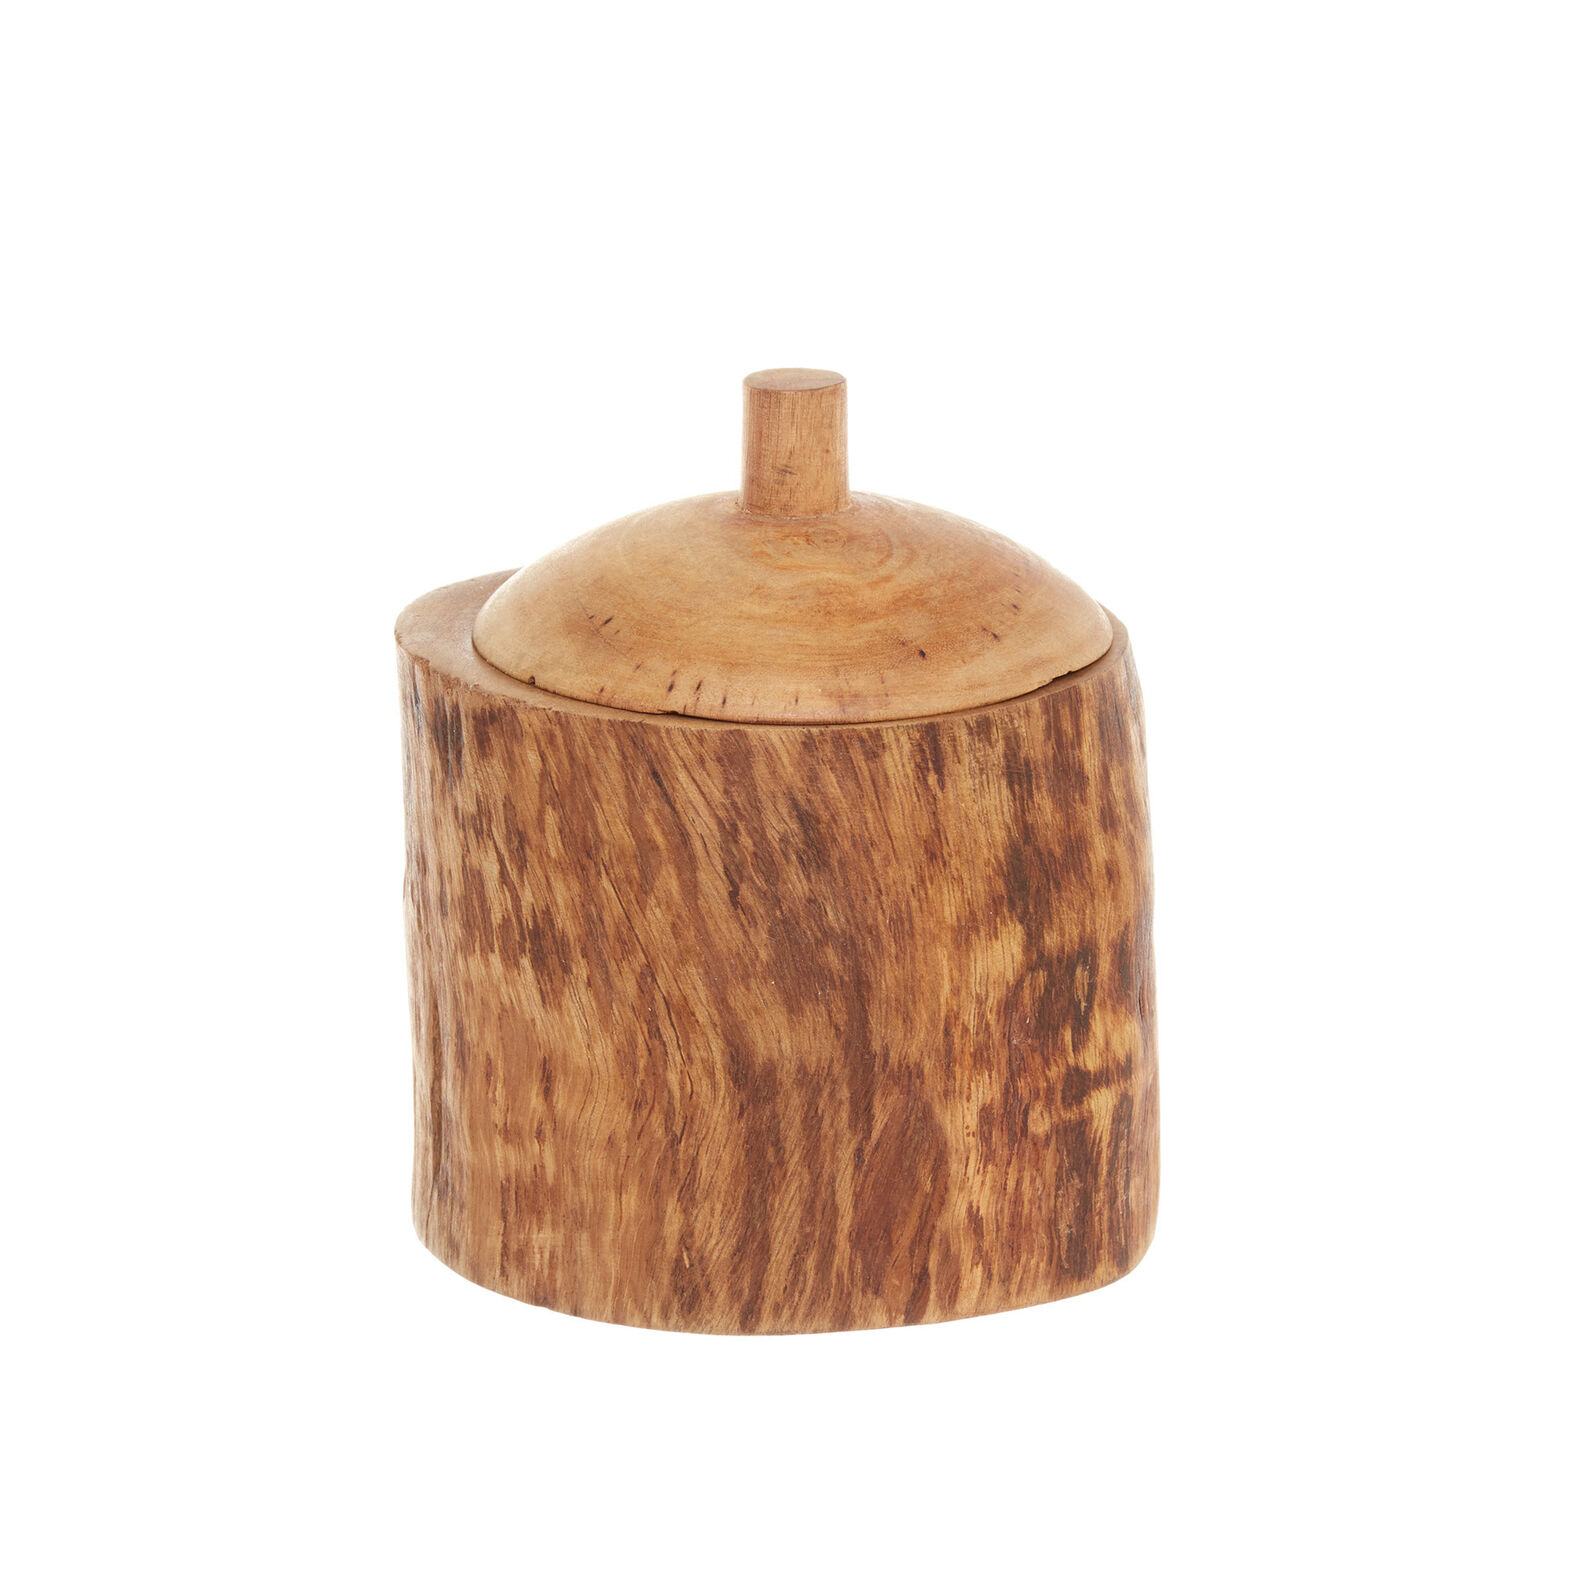 Hand-decorated box in mango wood